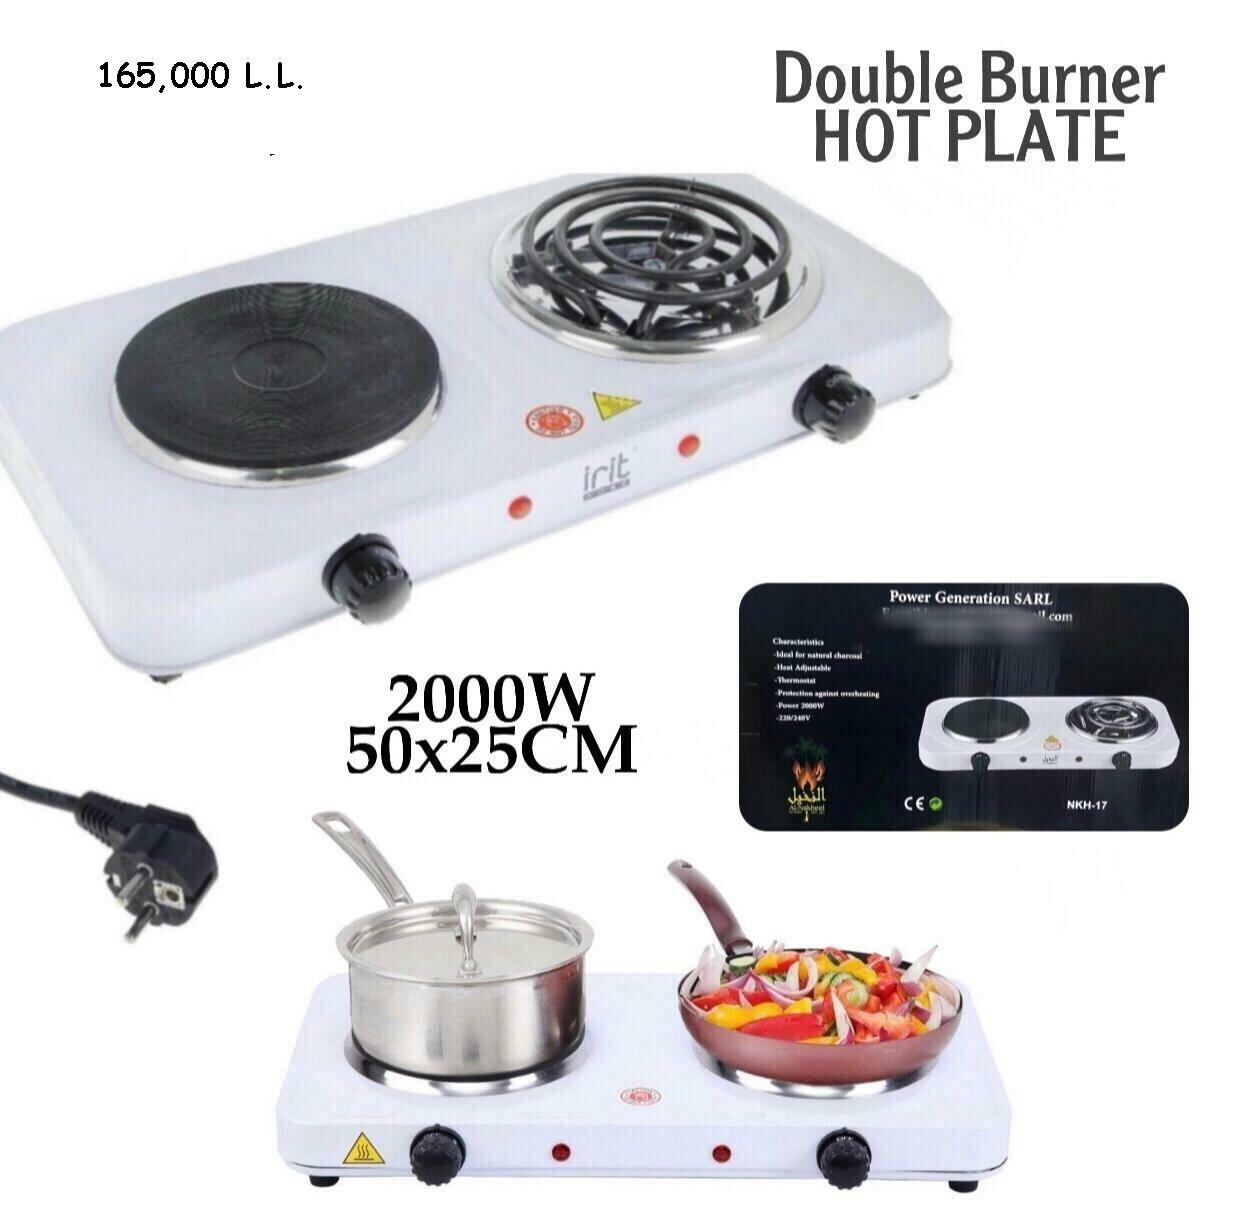 Double Burner Hot Plate